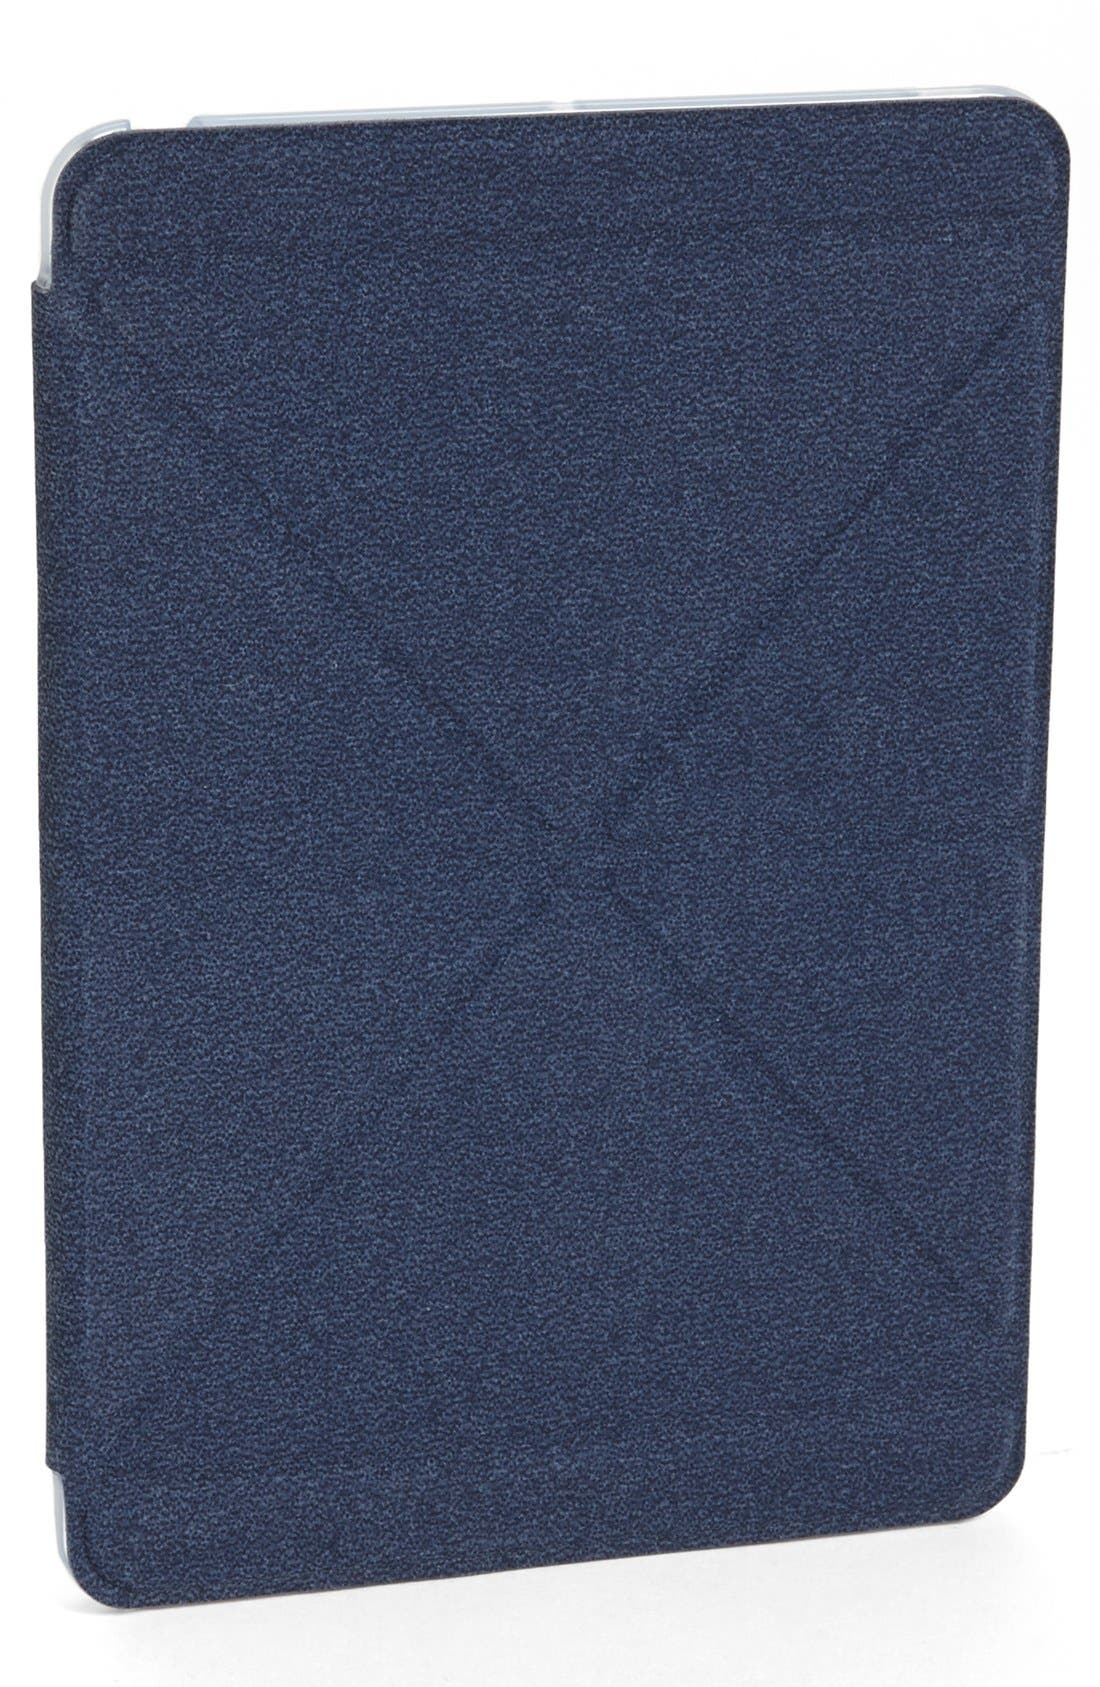 Alternate Image 1 Selected - Moshi 'VersaCover' iPad mini™ Cover